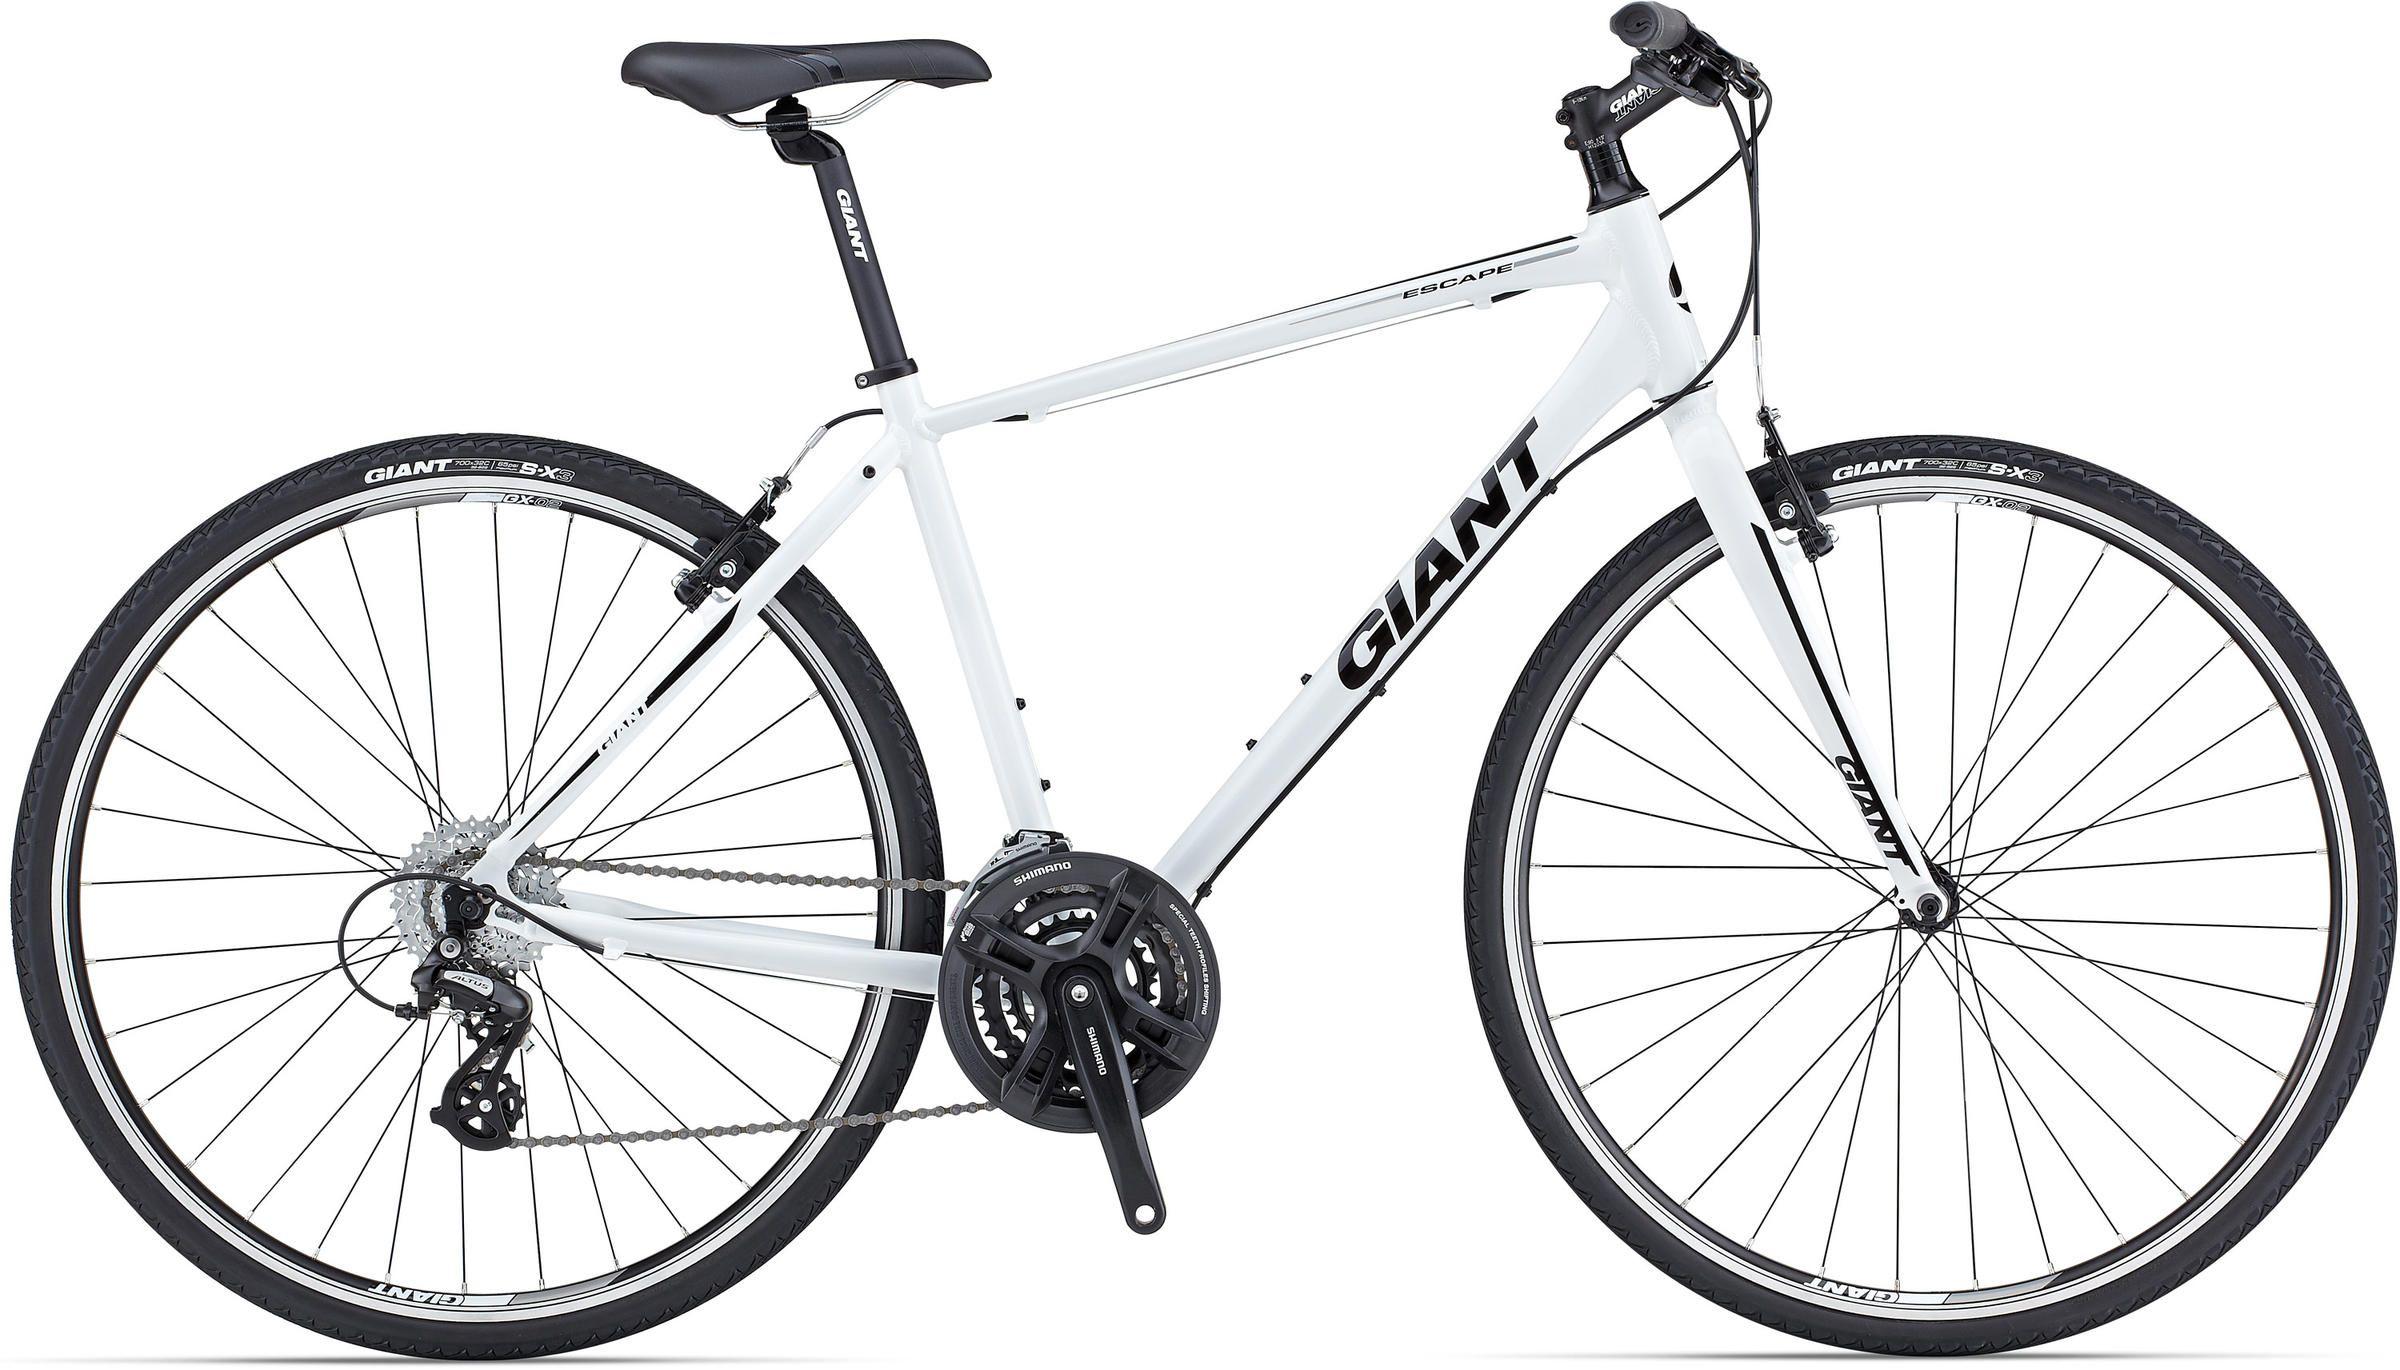 Giant Escape 2 Ride Brooklyn Bike Shop Hybrid Bike Bicycle Giant Bicycles